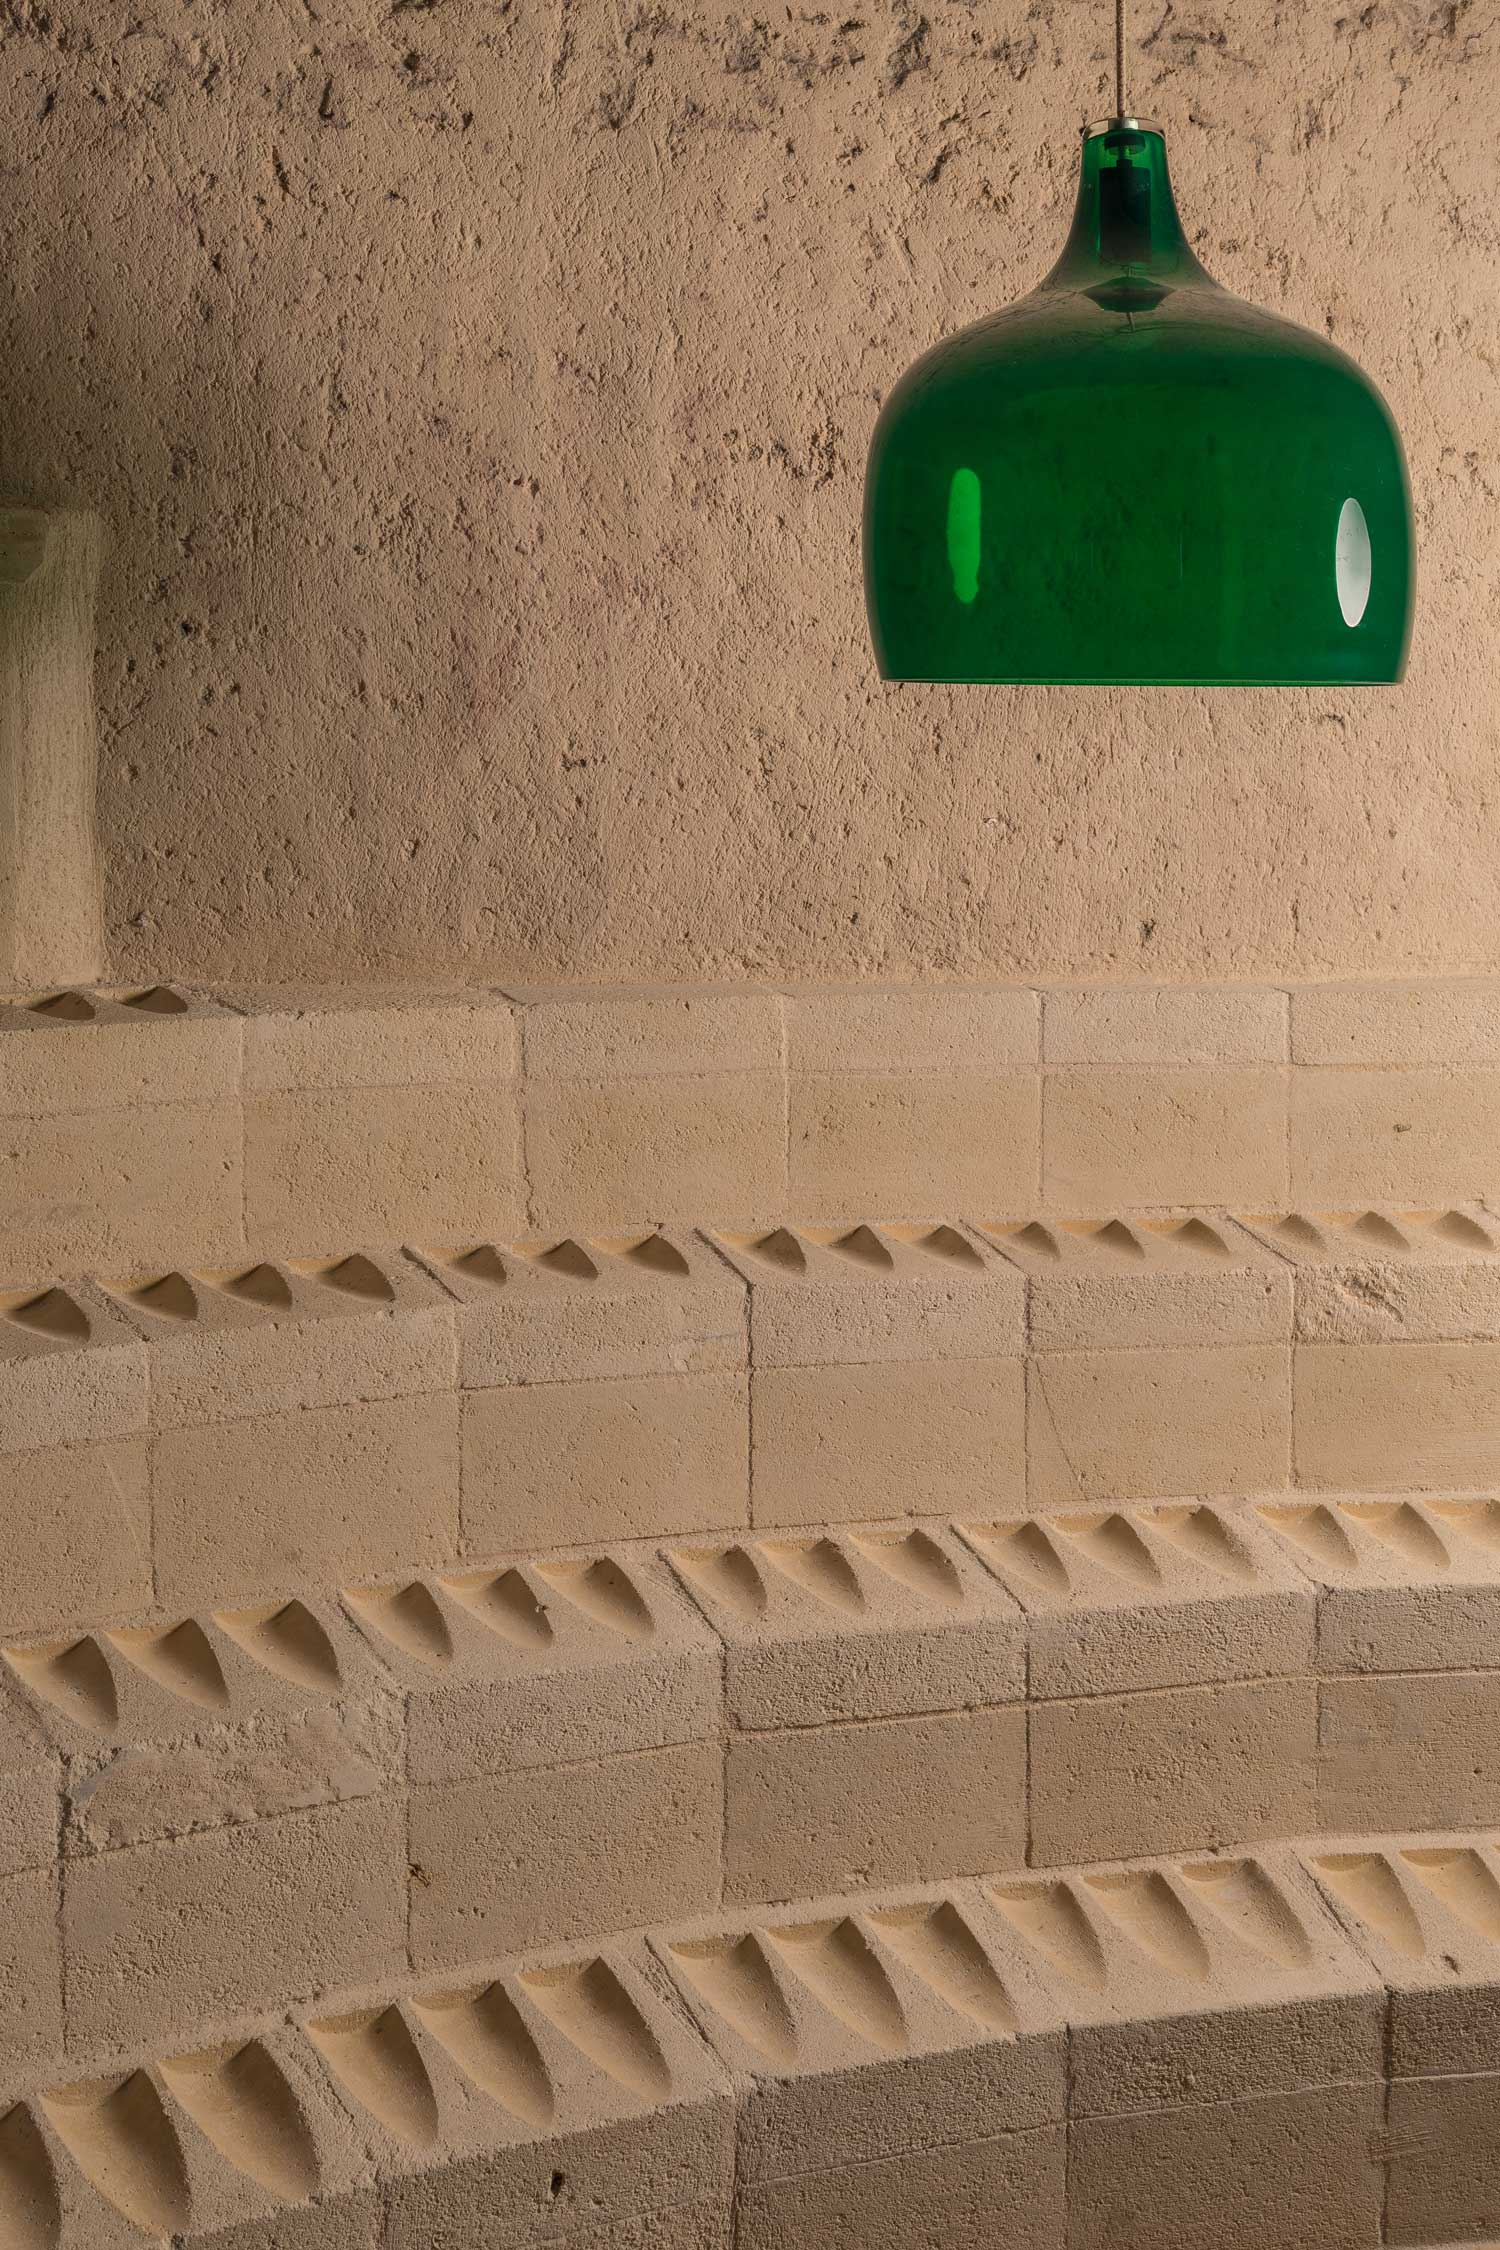 Enoteca-dai-Tosi-Wine-Bar-in-Matera-Italy-by-Architecten-De-Vylder-Vinck-Taillieu-cafeveyafe (13)